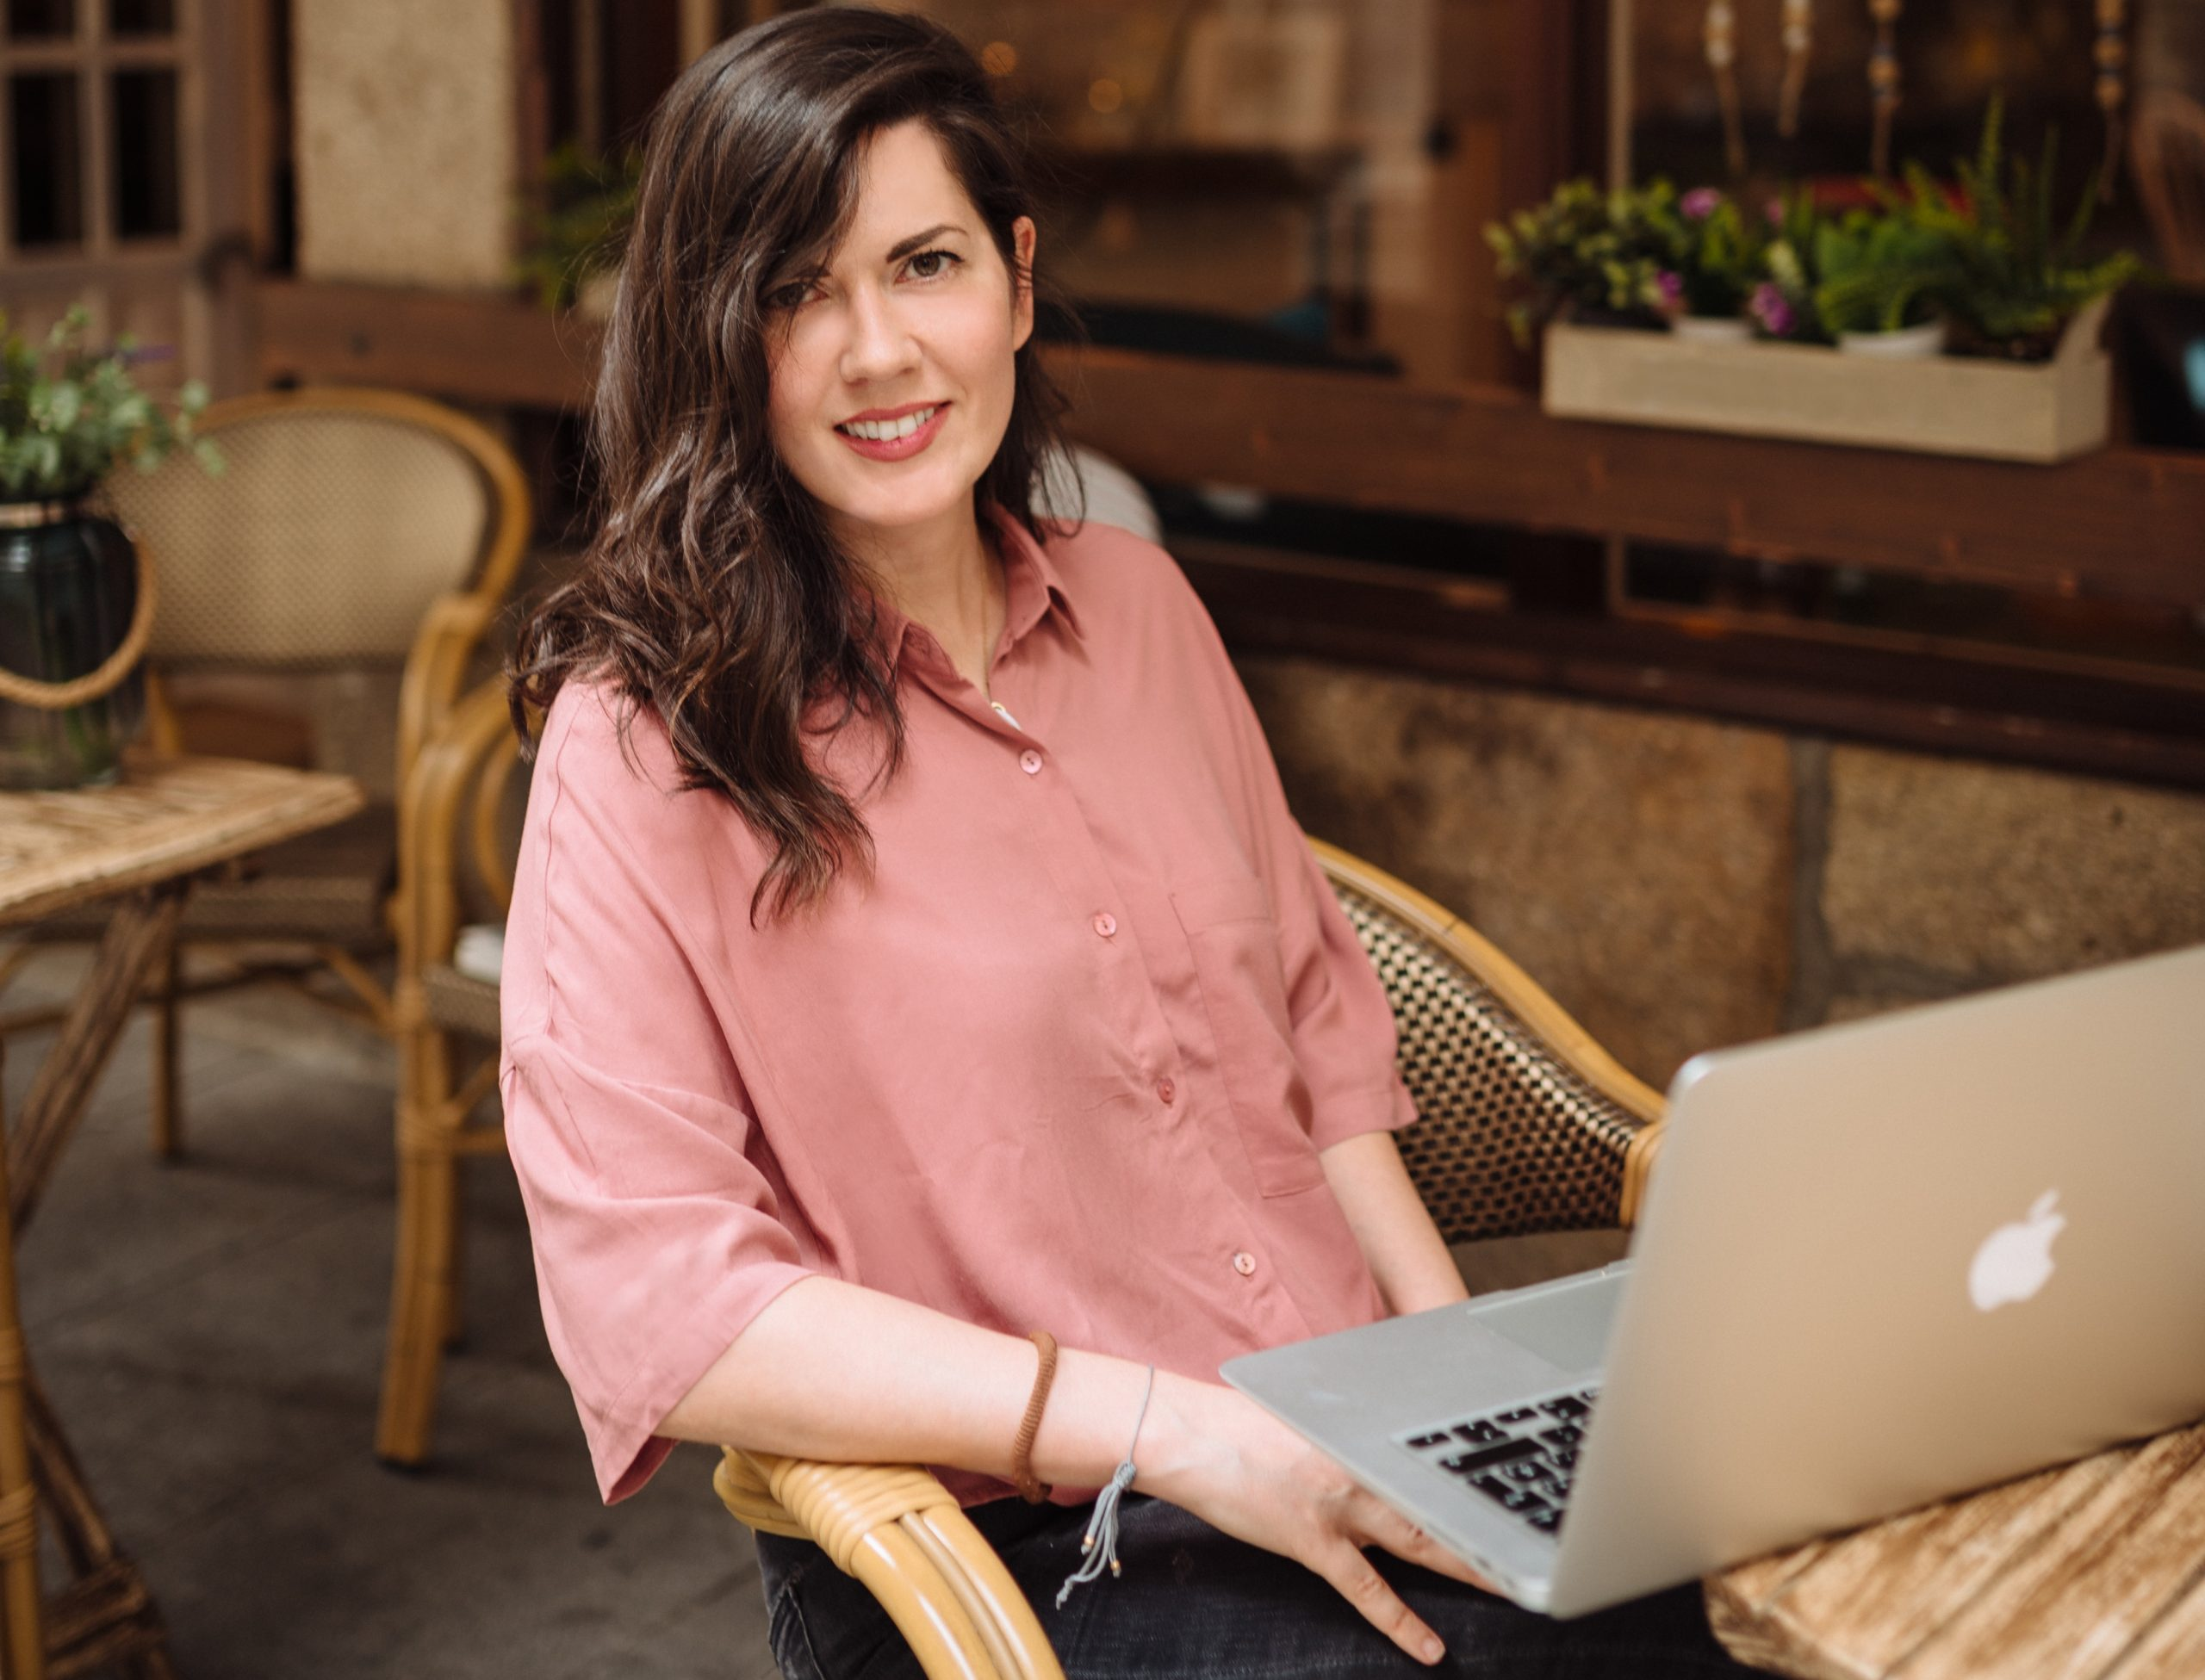 Julia Gomez Working